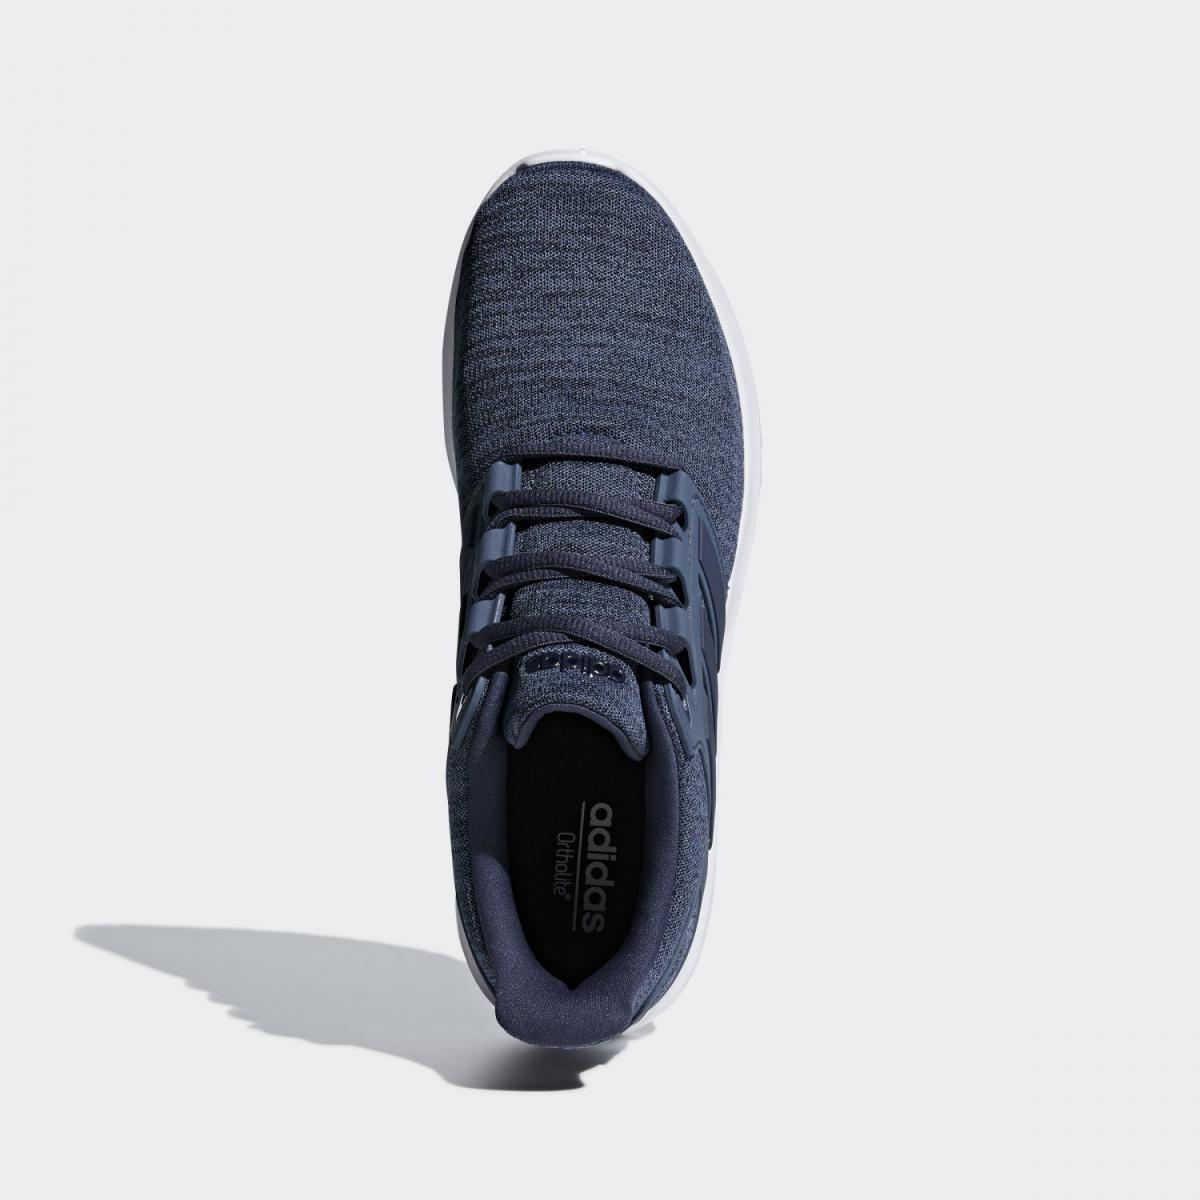 Adidas Energy Cloud 2 (Navy Blue)